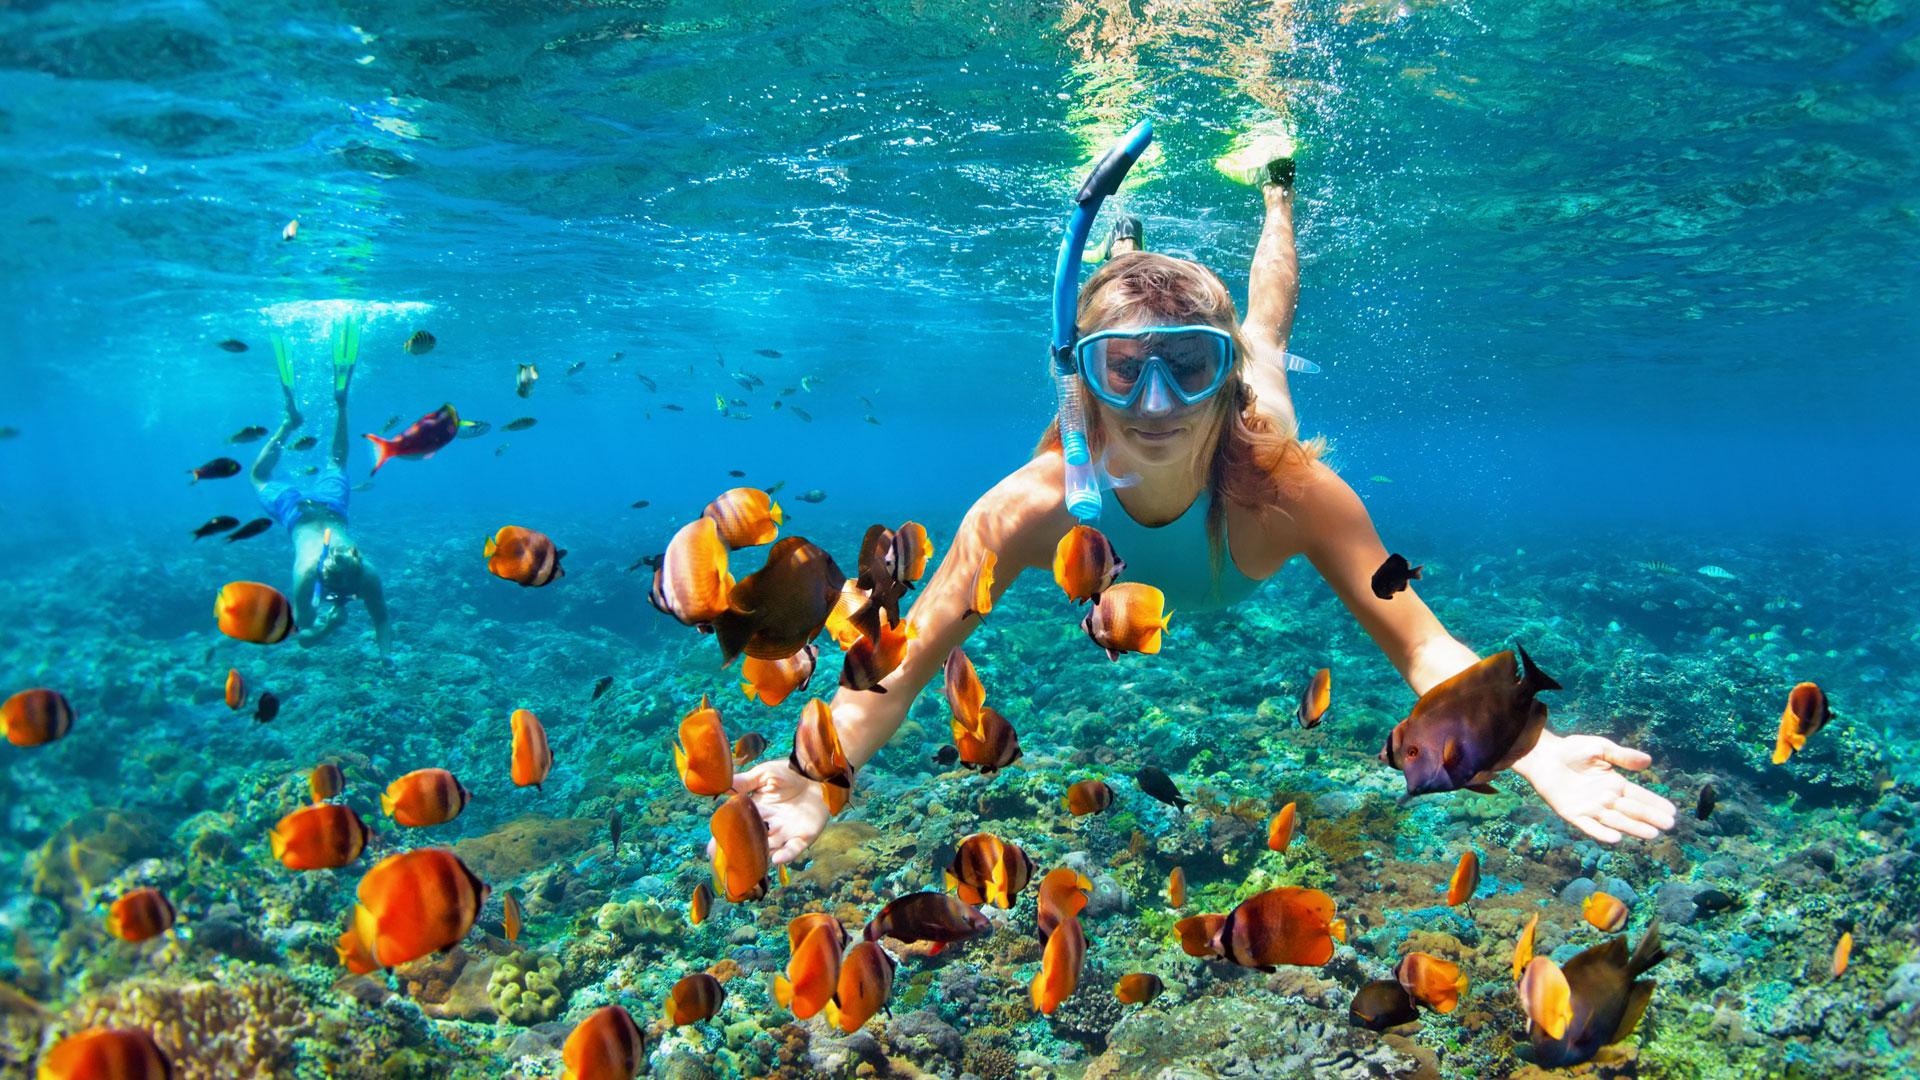 Actividades de ecoturismo en Cancún